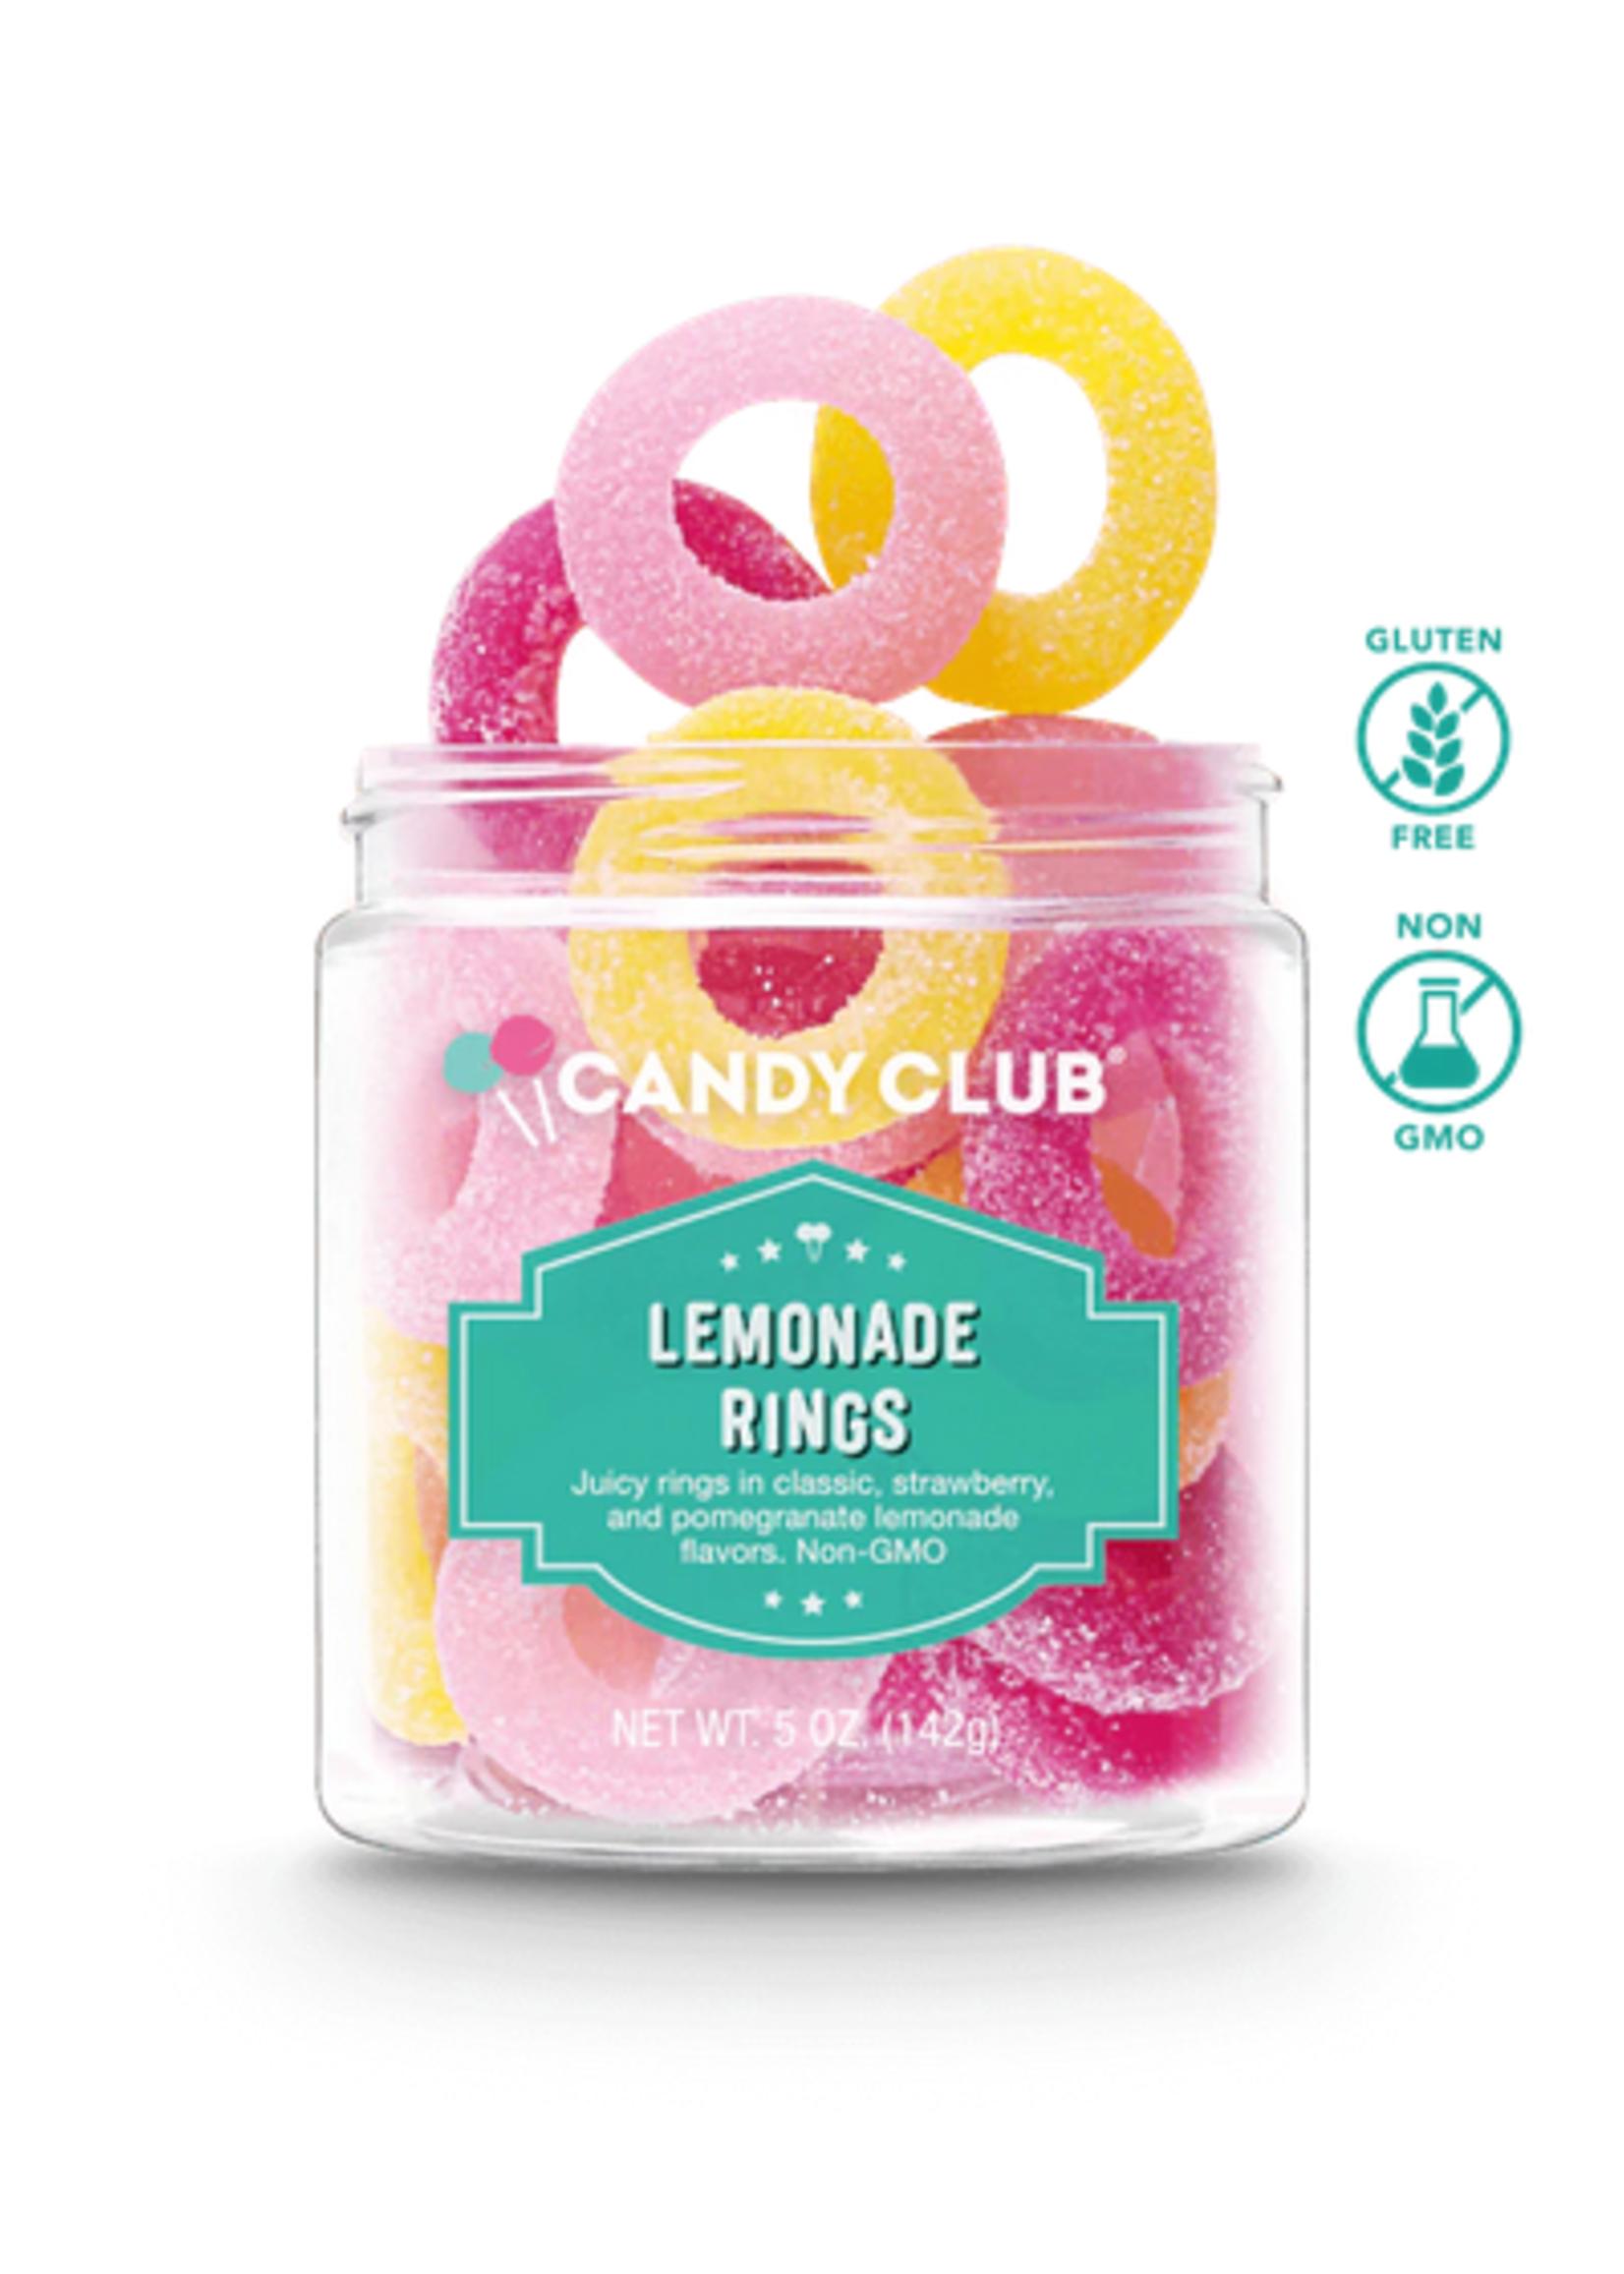 candy club lemonade rings